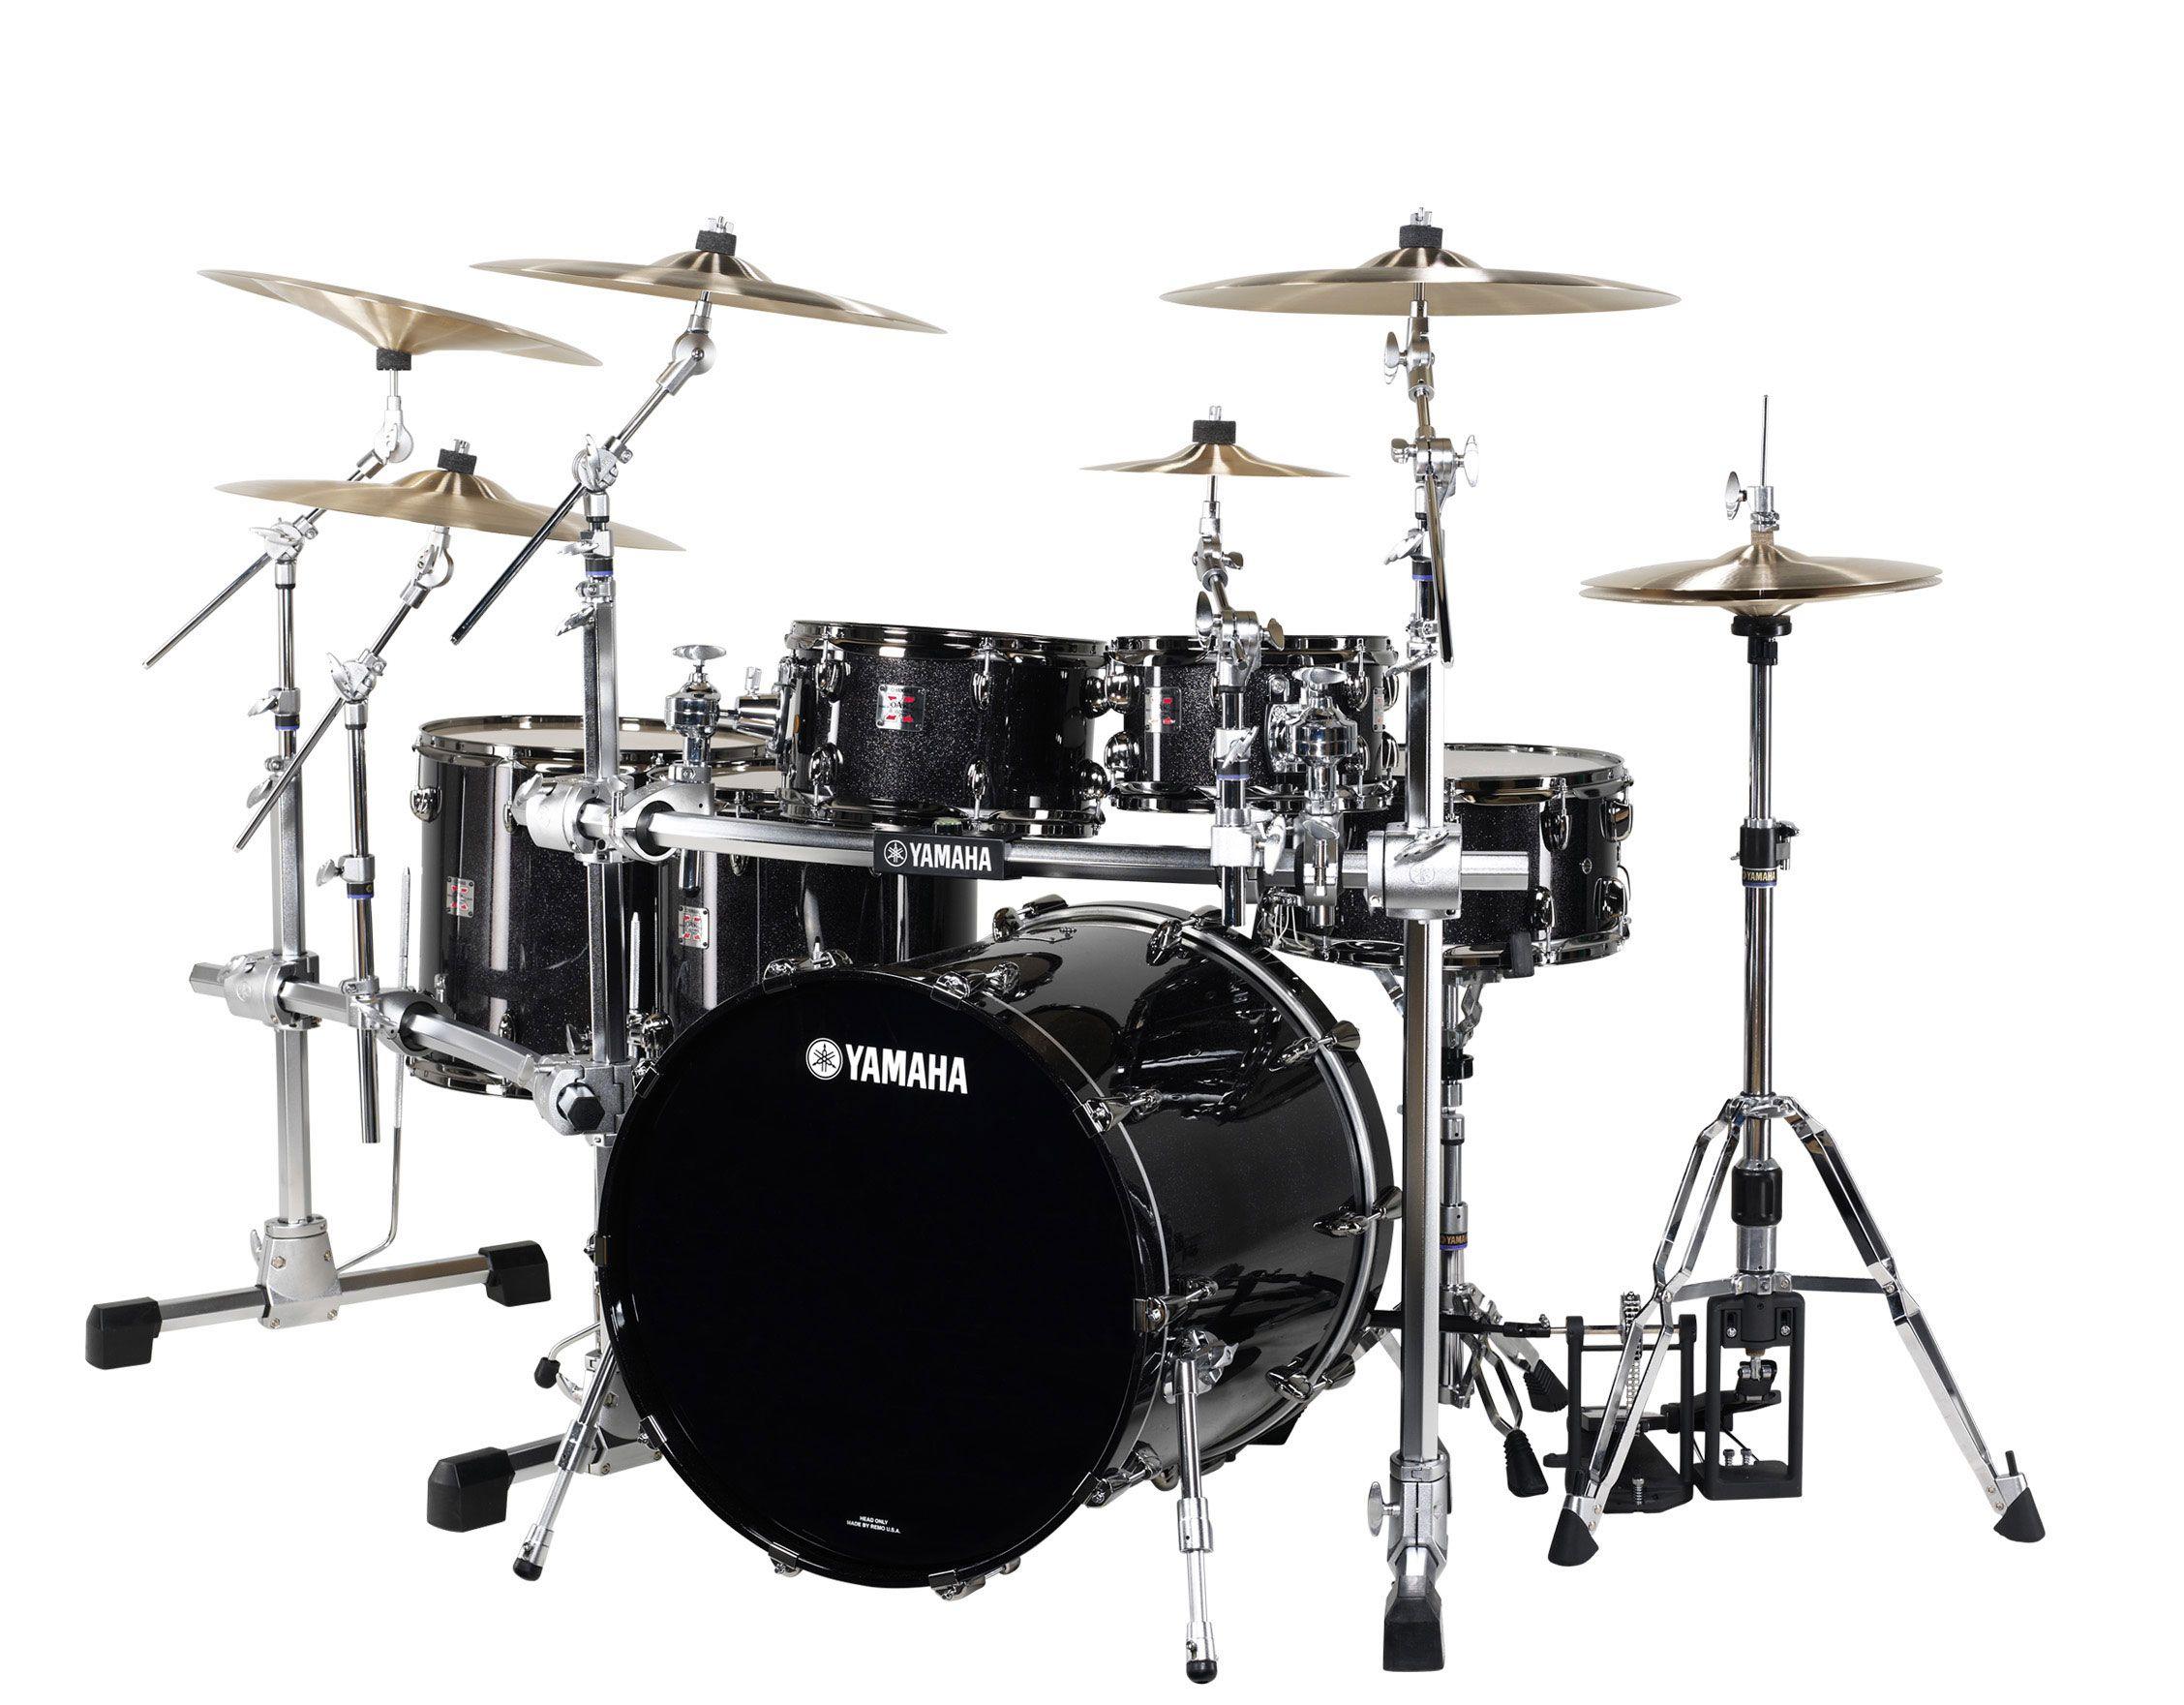 cc8cfb30762 Yamaha OAK Custom X acoustic drum kit